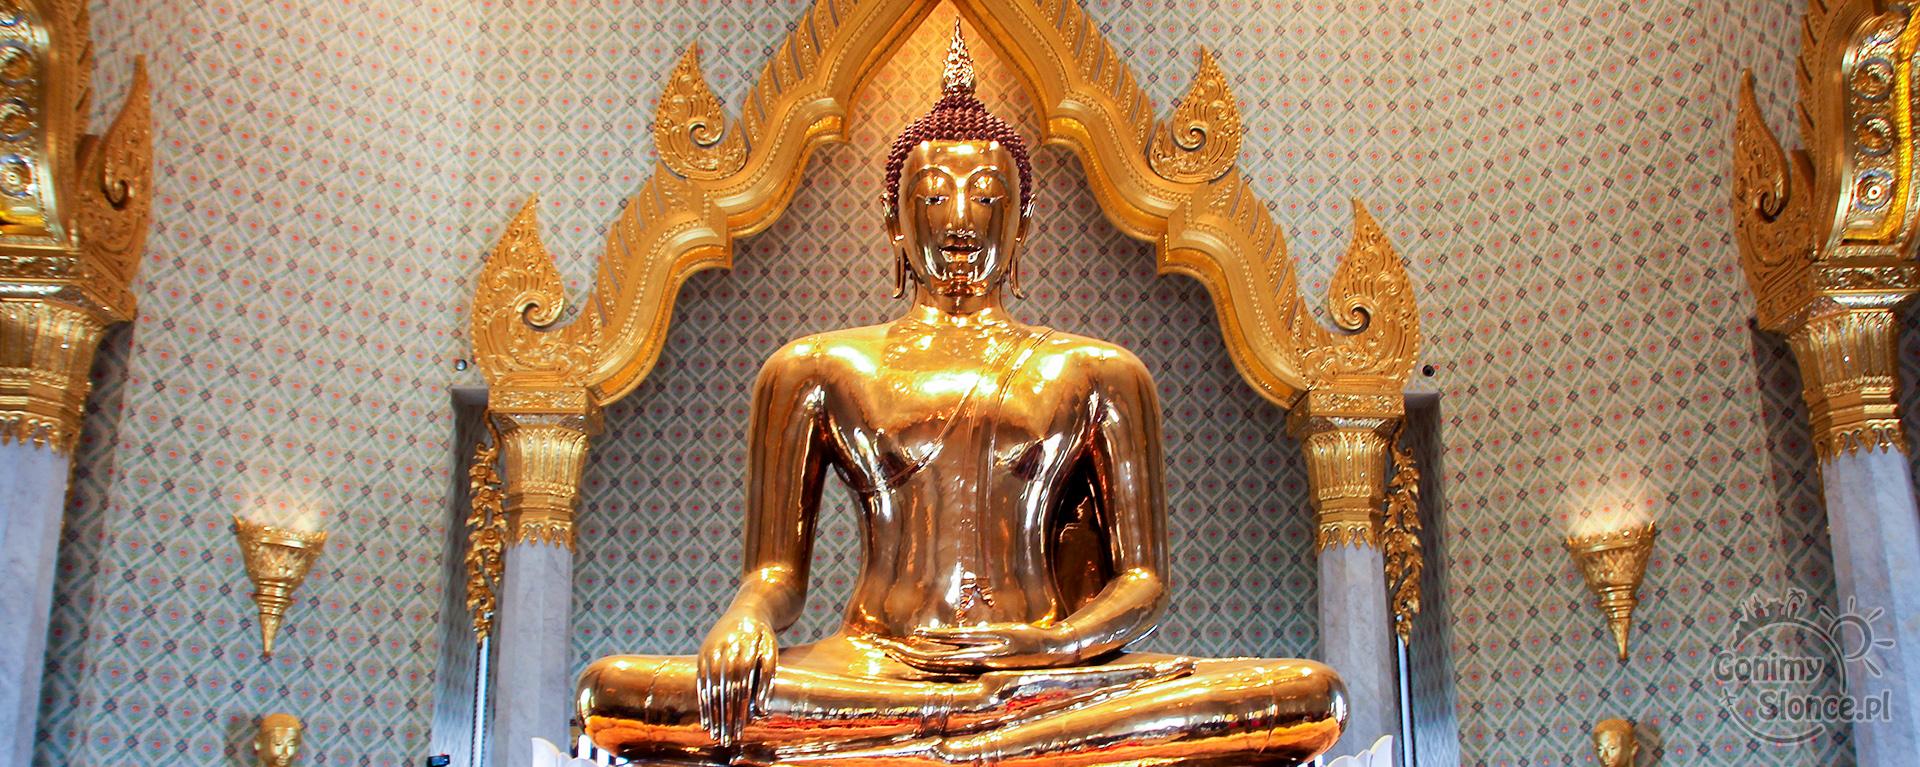 Złoty Budda, Wat Traimit, Bangkok